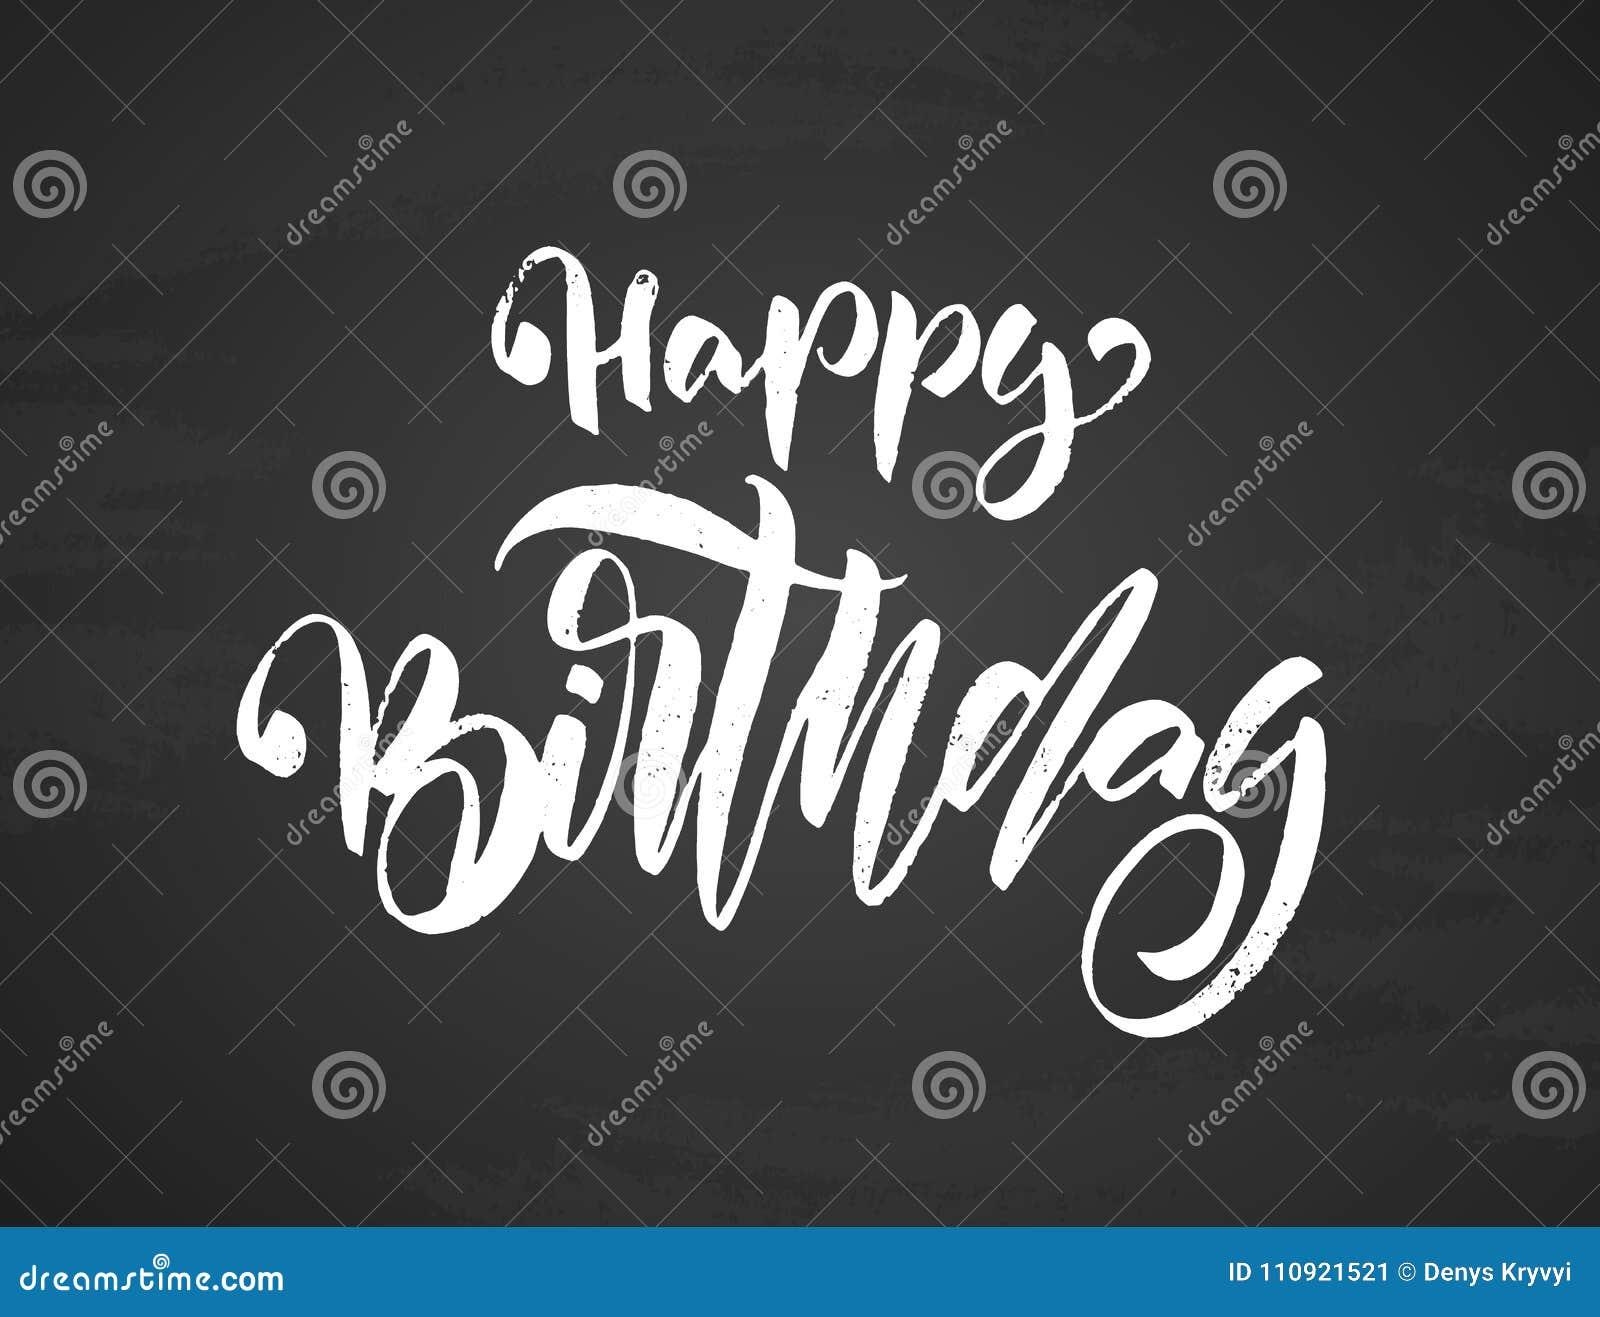 Handwritten Textured Brush Type Lettering Of Happy Birthday On